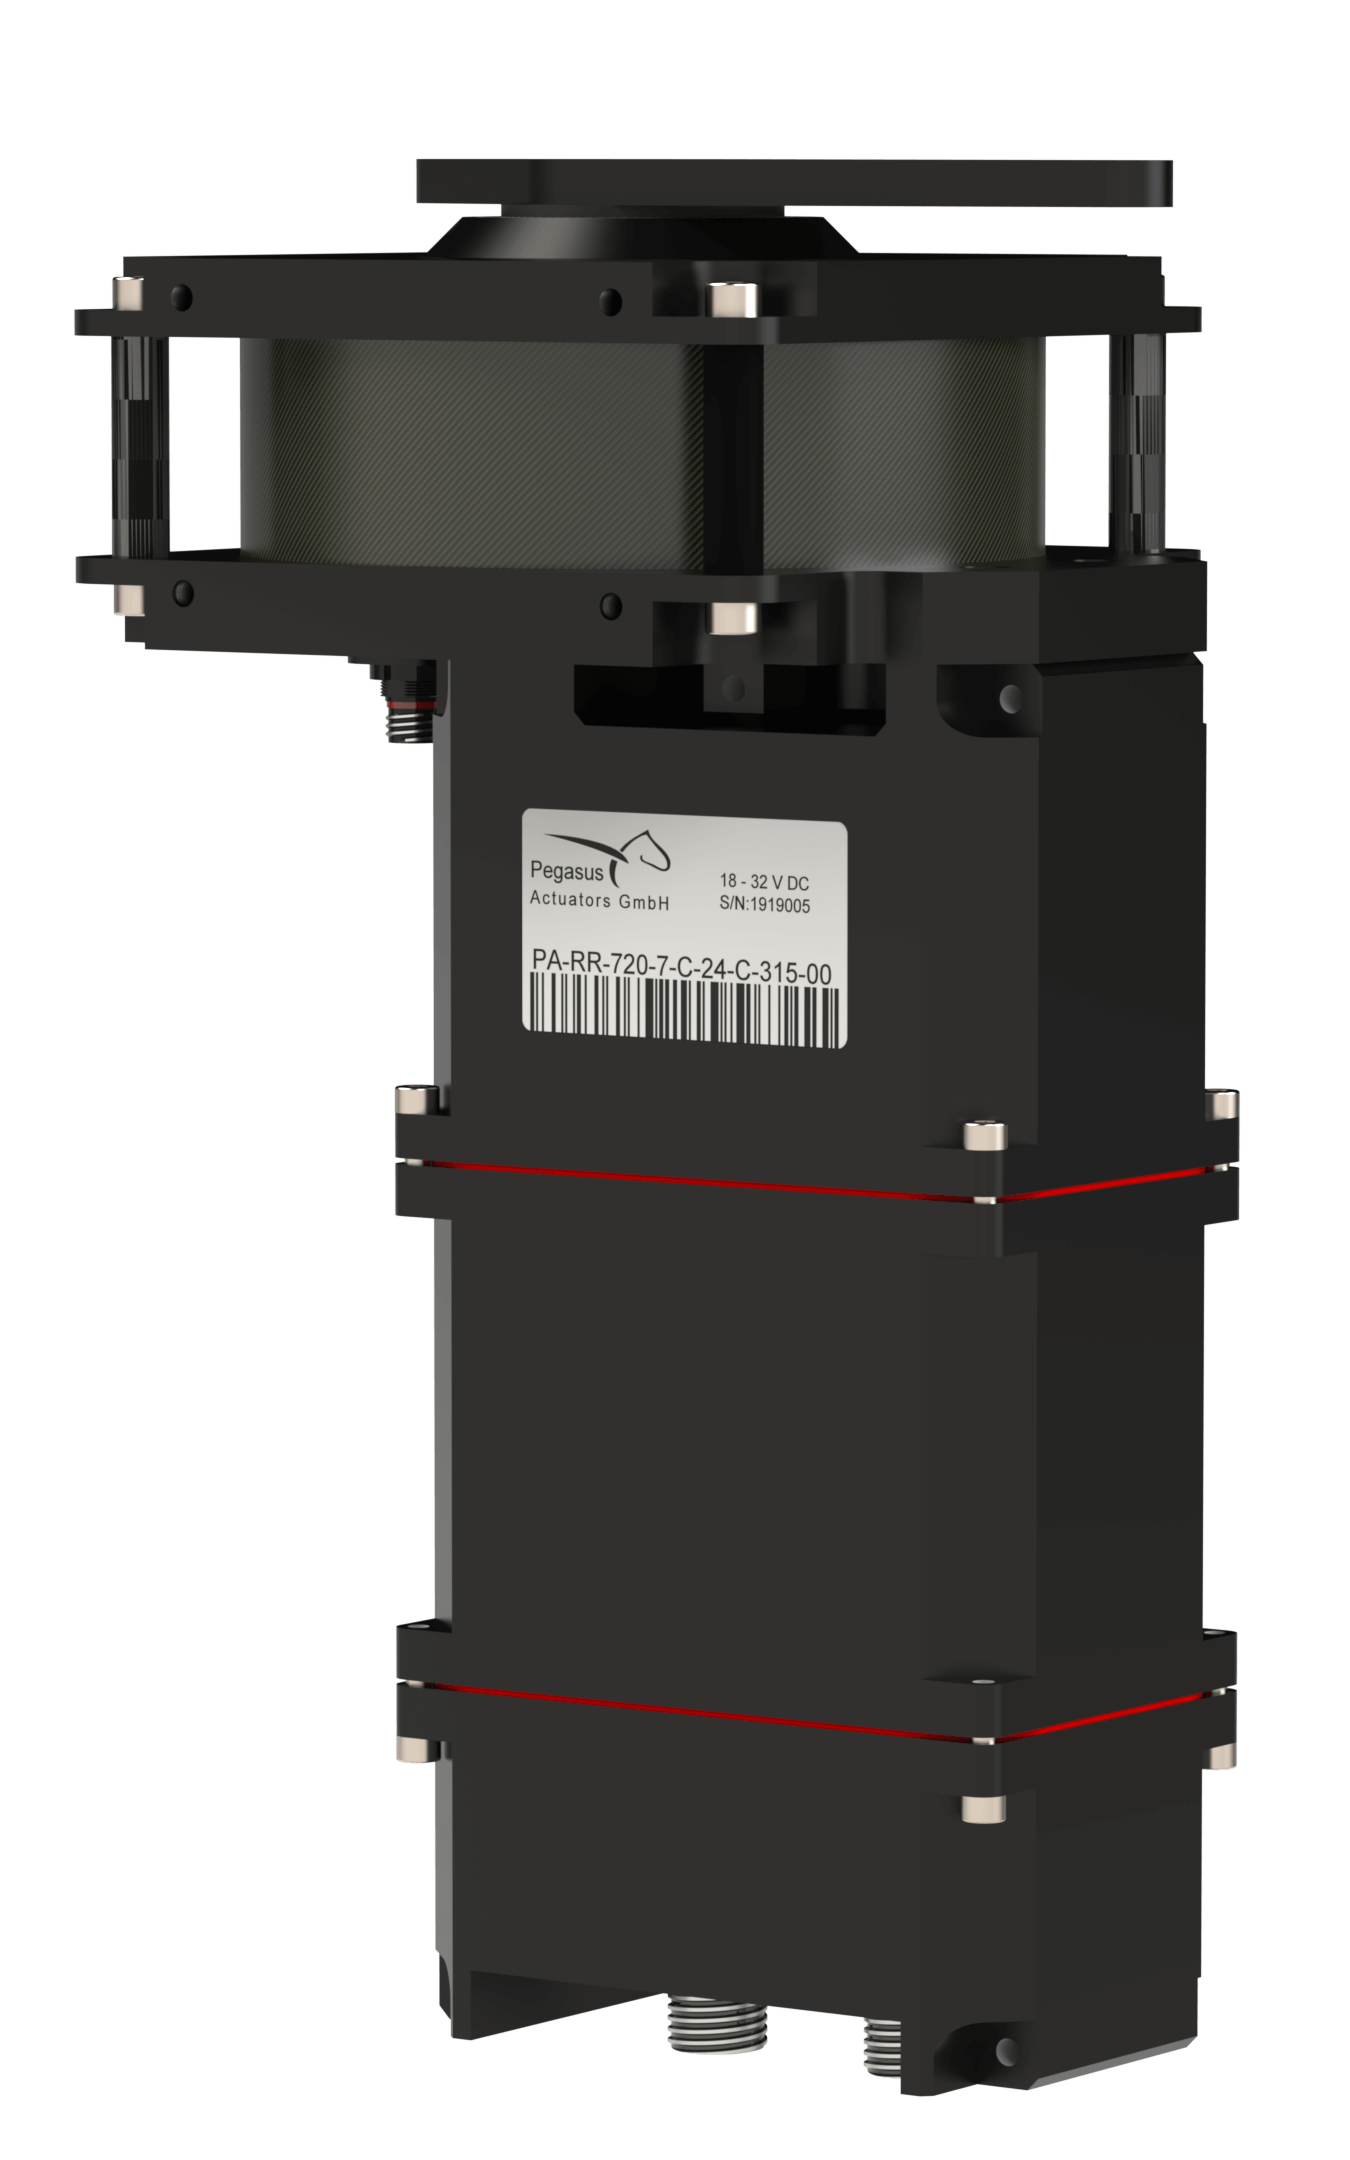 PA-RR-720-7-OPV Actuators